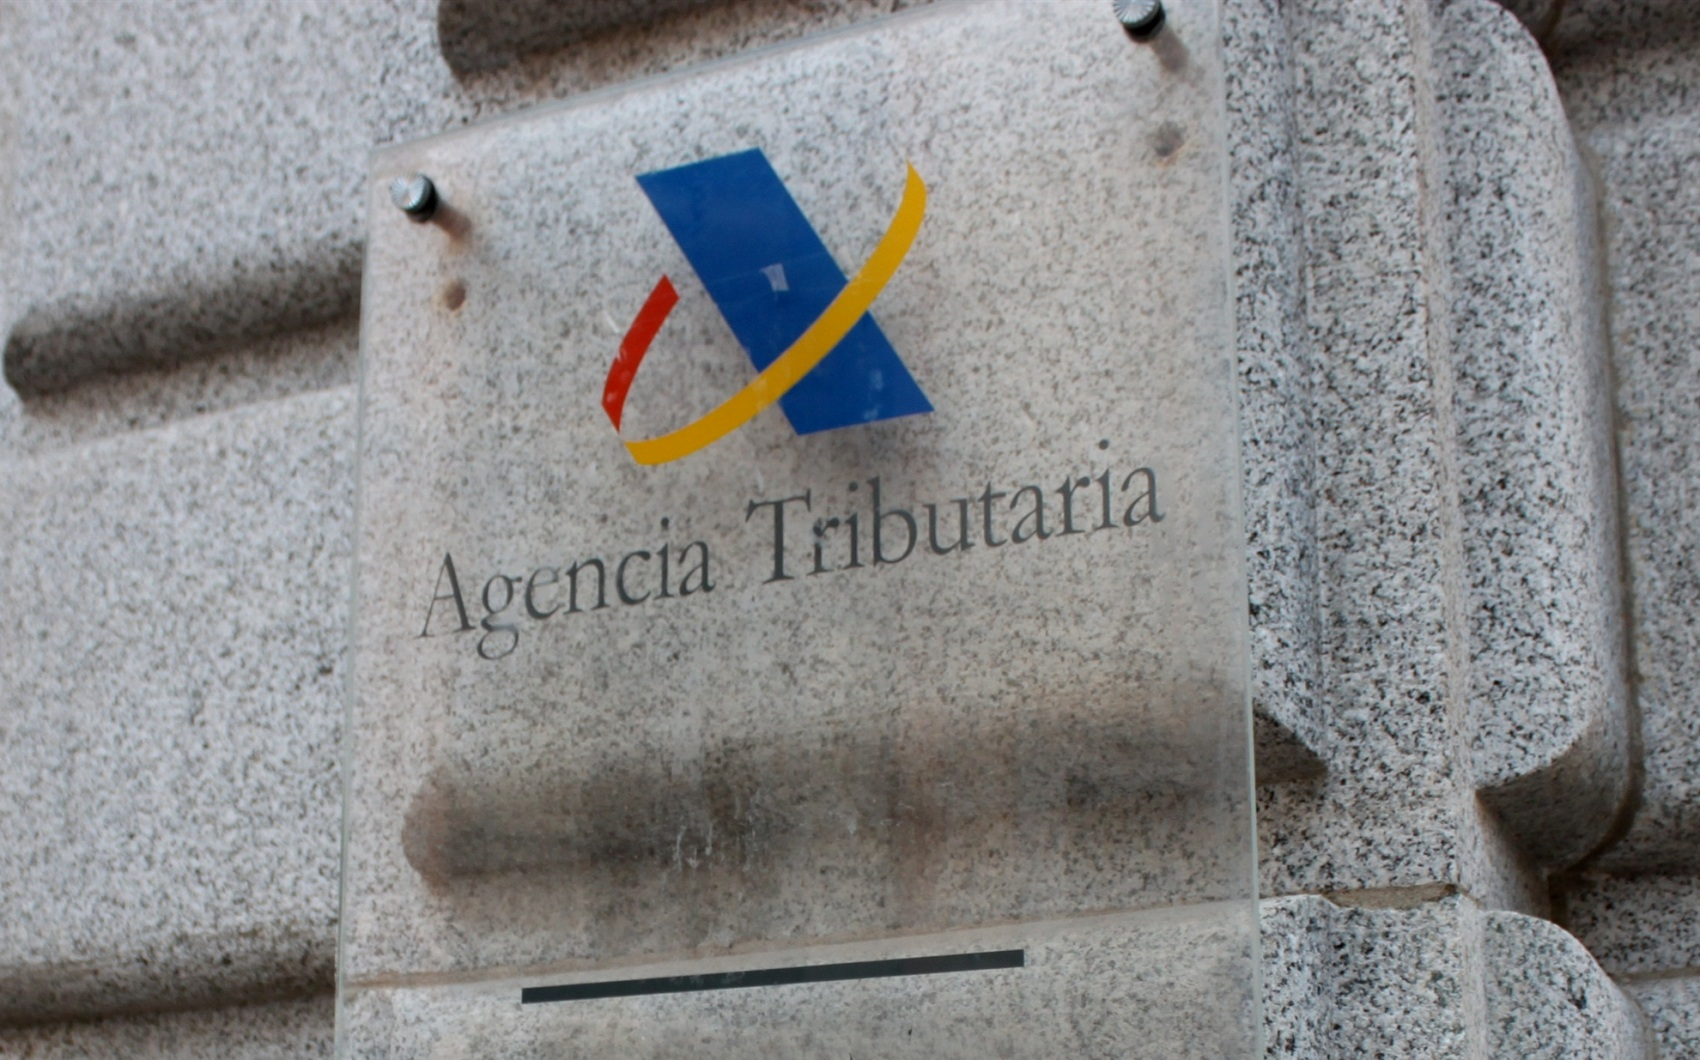 agencia_tributaria_ep_270513